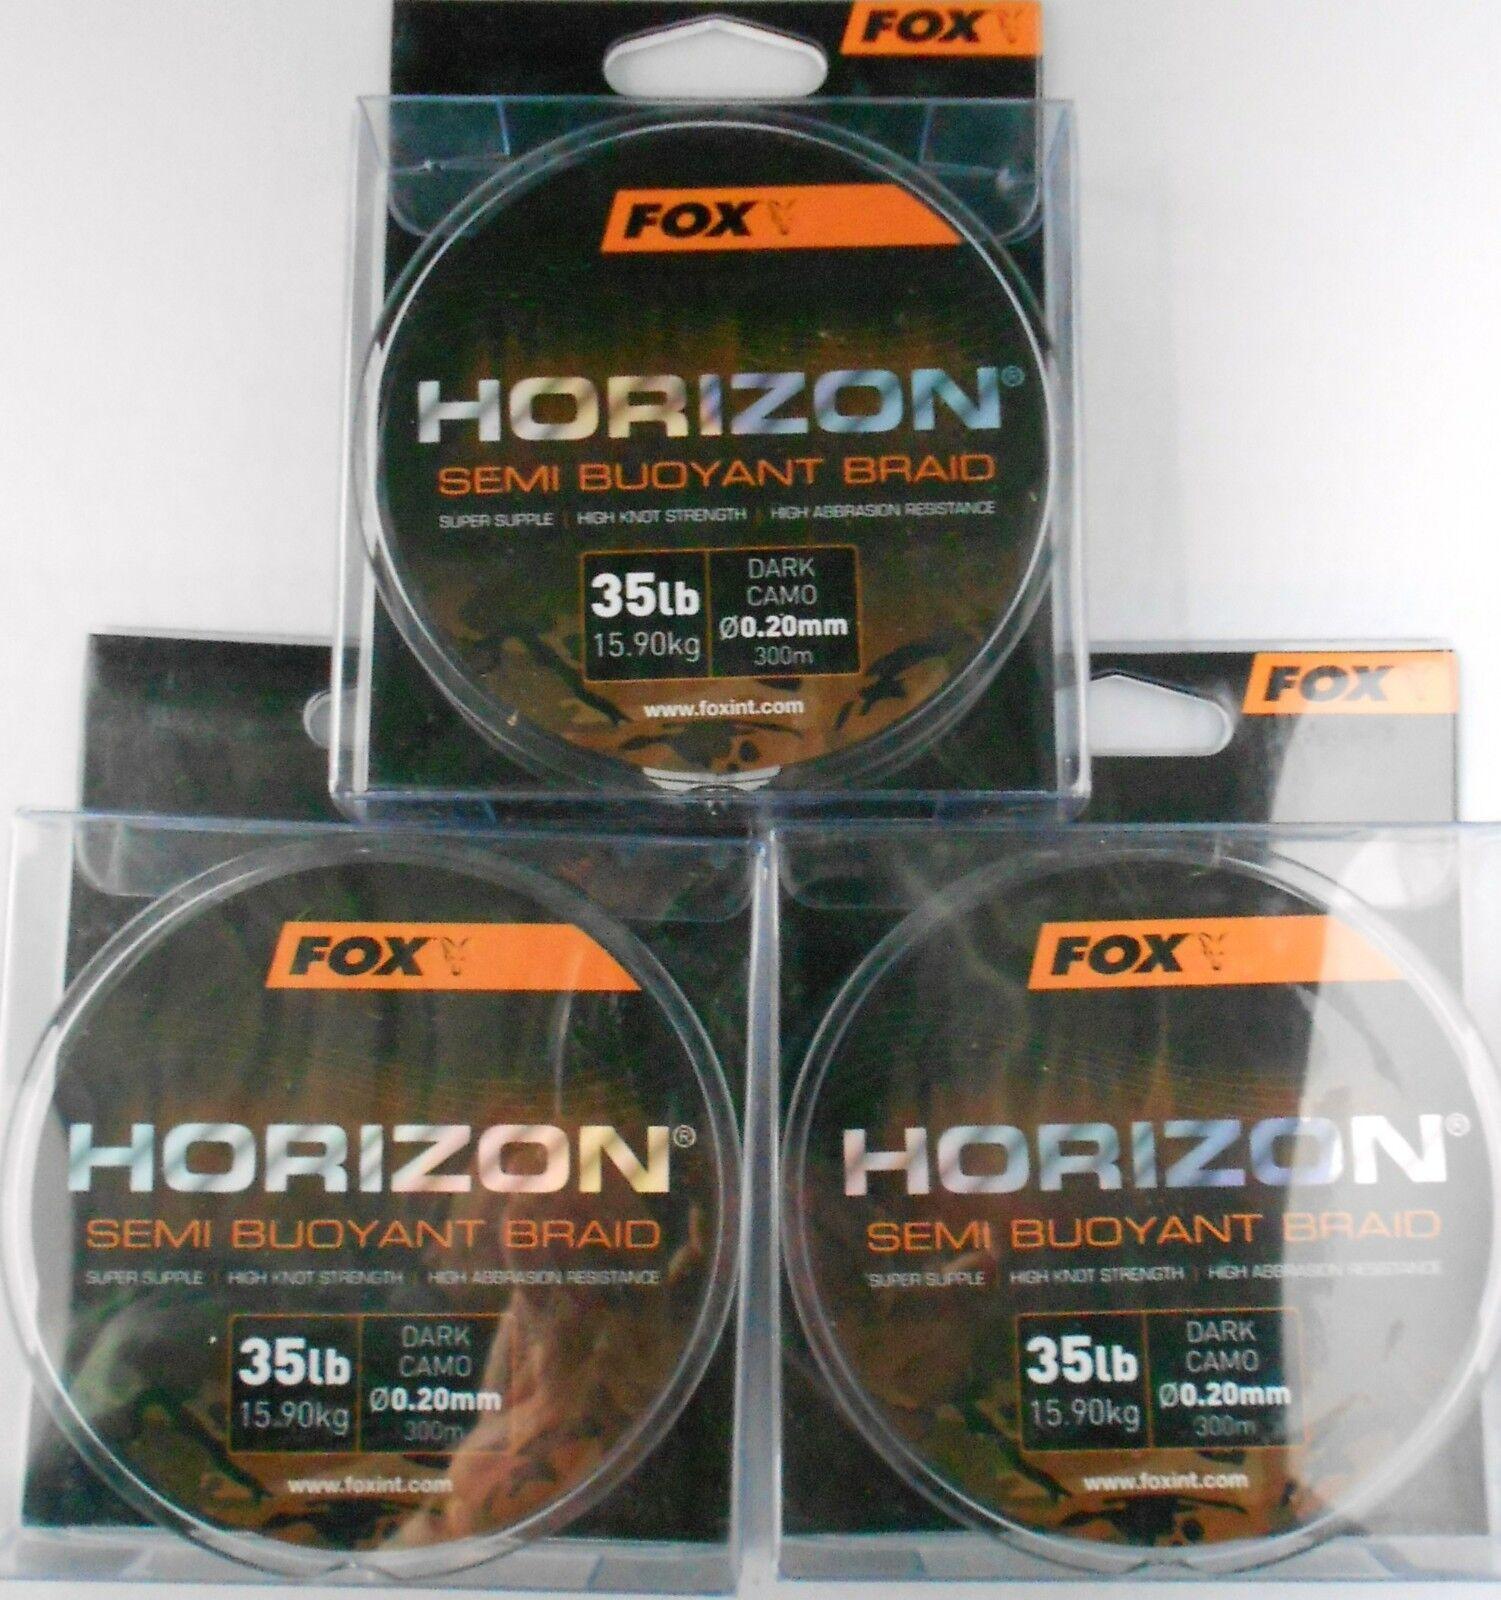 3 x FOX HORIZON SEMI BUOYANT BRAID 35lb 15.9kg 300m 0.20mm DARK CAMO CBL014